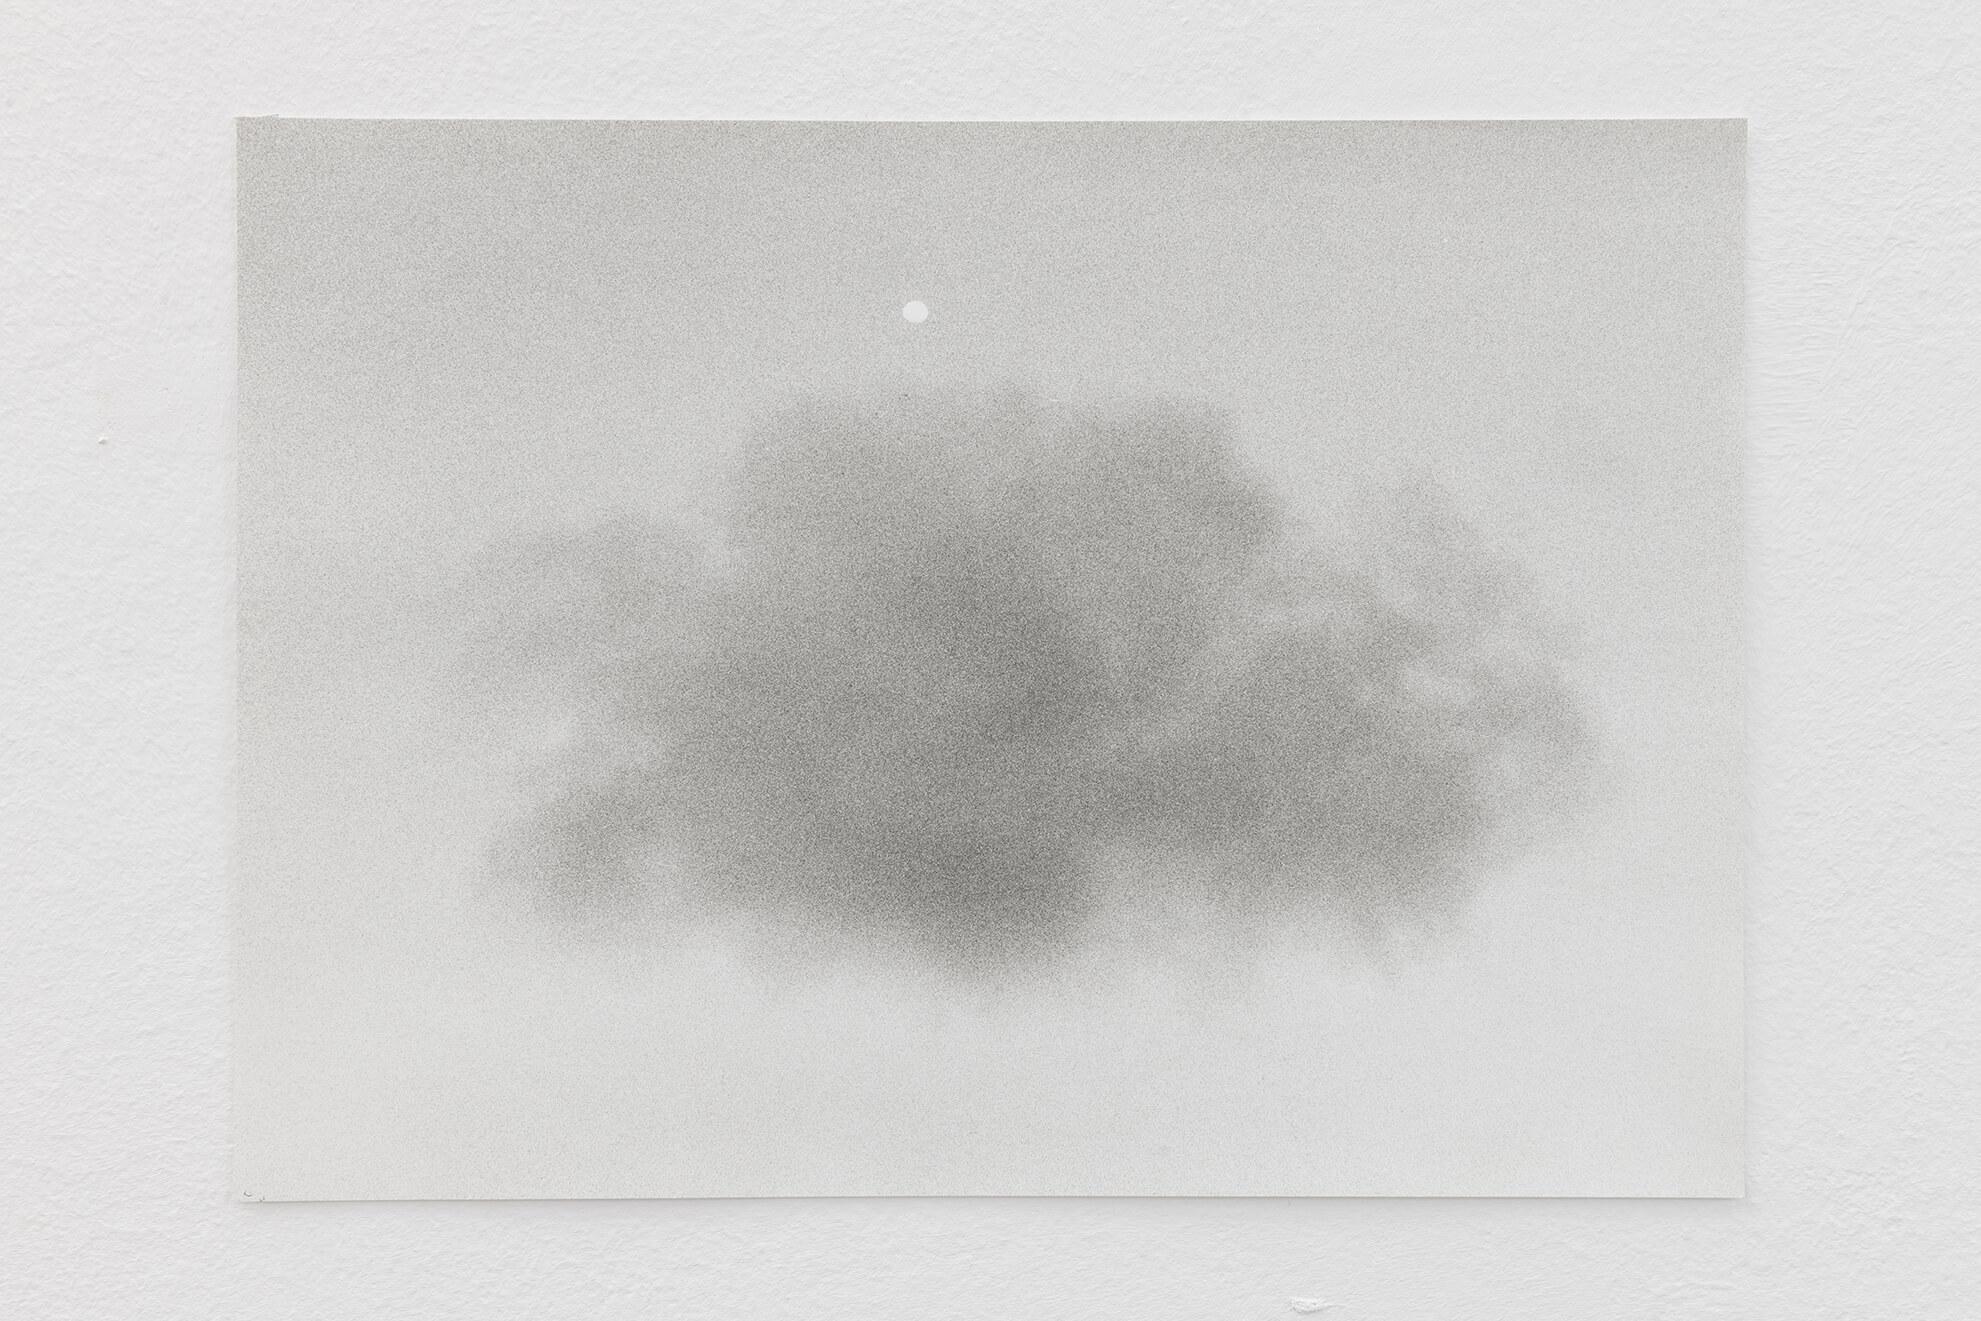 Untitled (Moon / Cloud), 2020 | JOCHEN LEMPERT: VISIBLE LIGHT | ProjecteSD